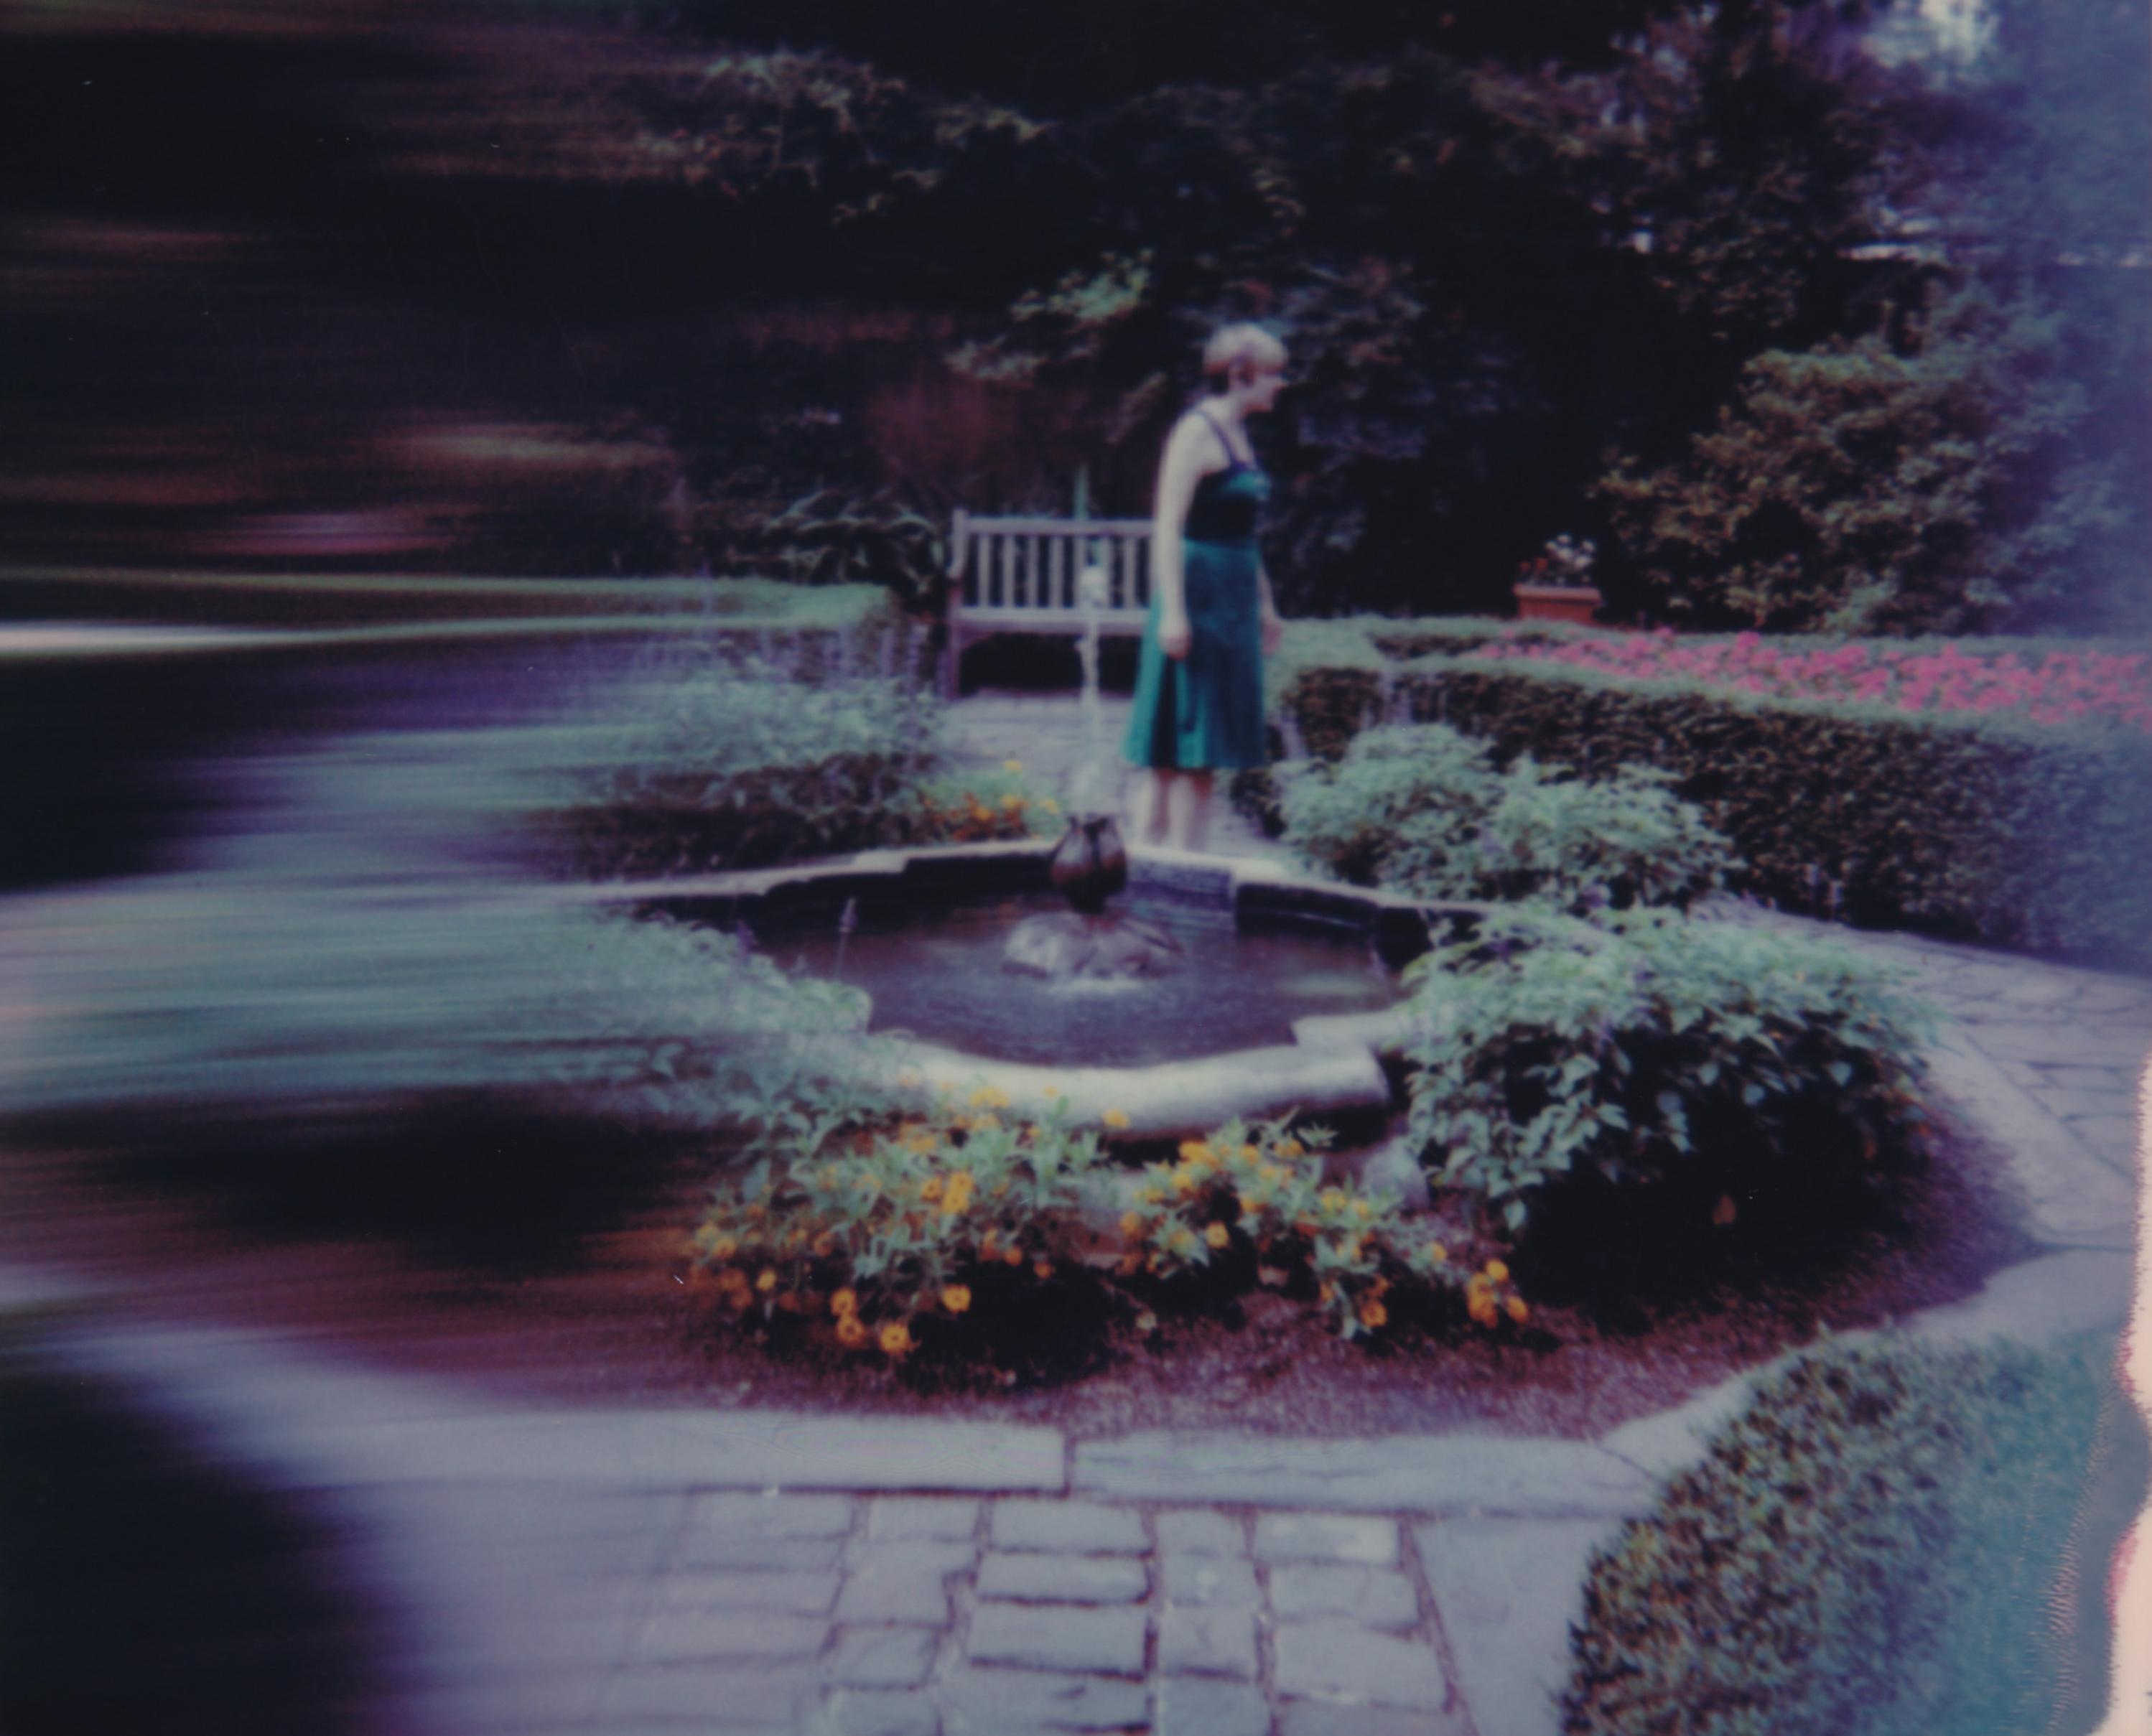 Emergence - Contemporary, Woman, Polaroid, Figurative, 21st Century, Landscape